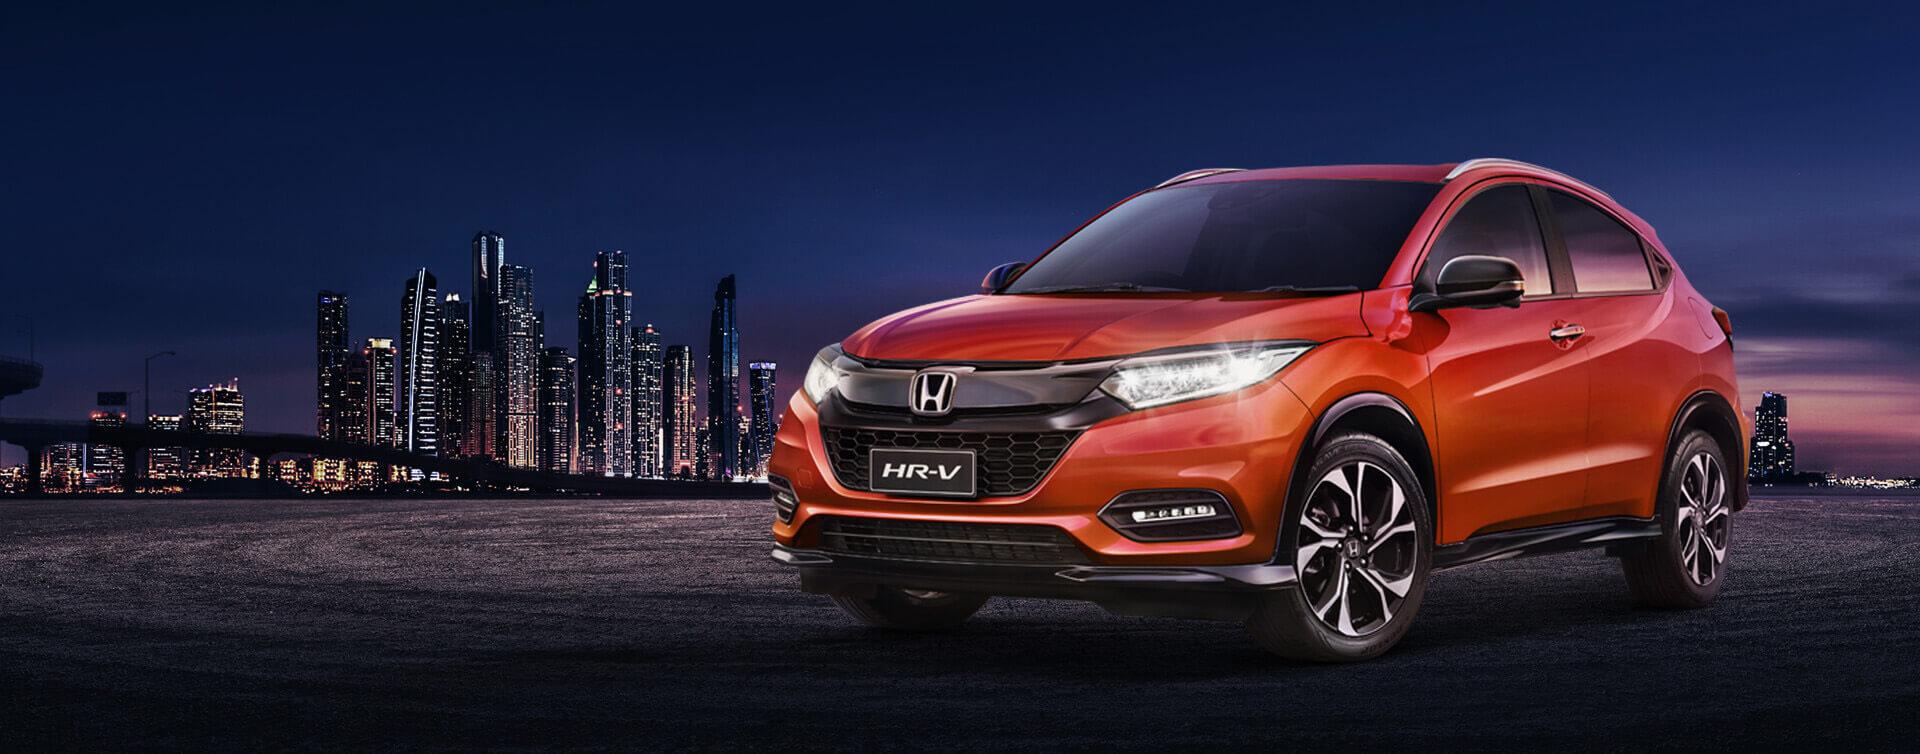 Owners Honda Com >> New Honda Hr V For Sale In Shepparton Darryl Twitt Honda